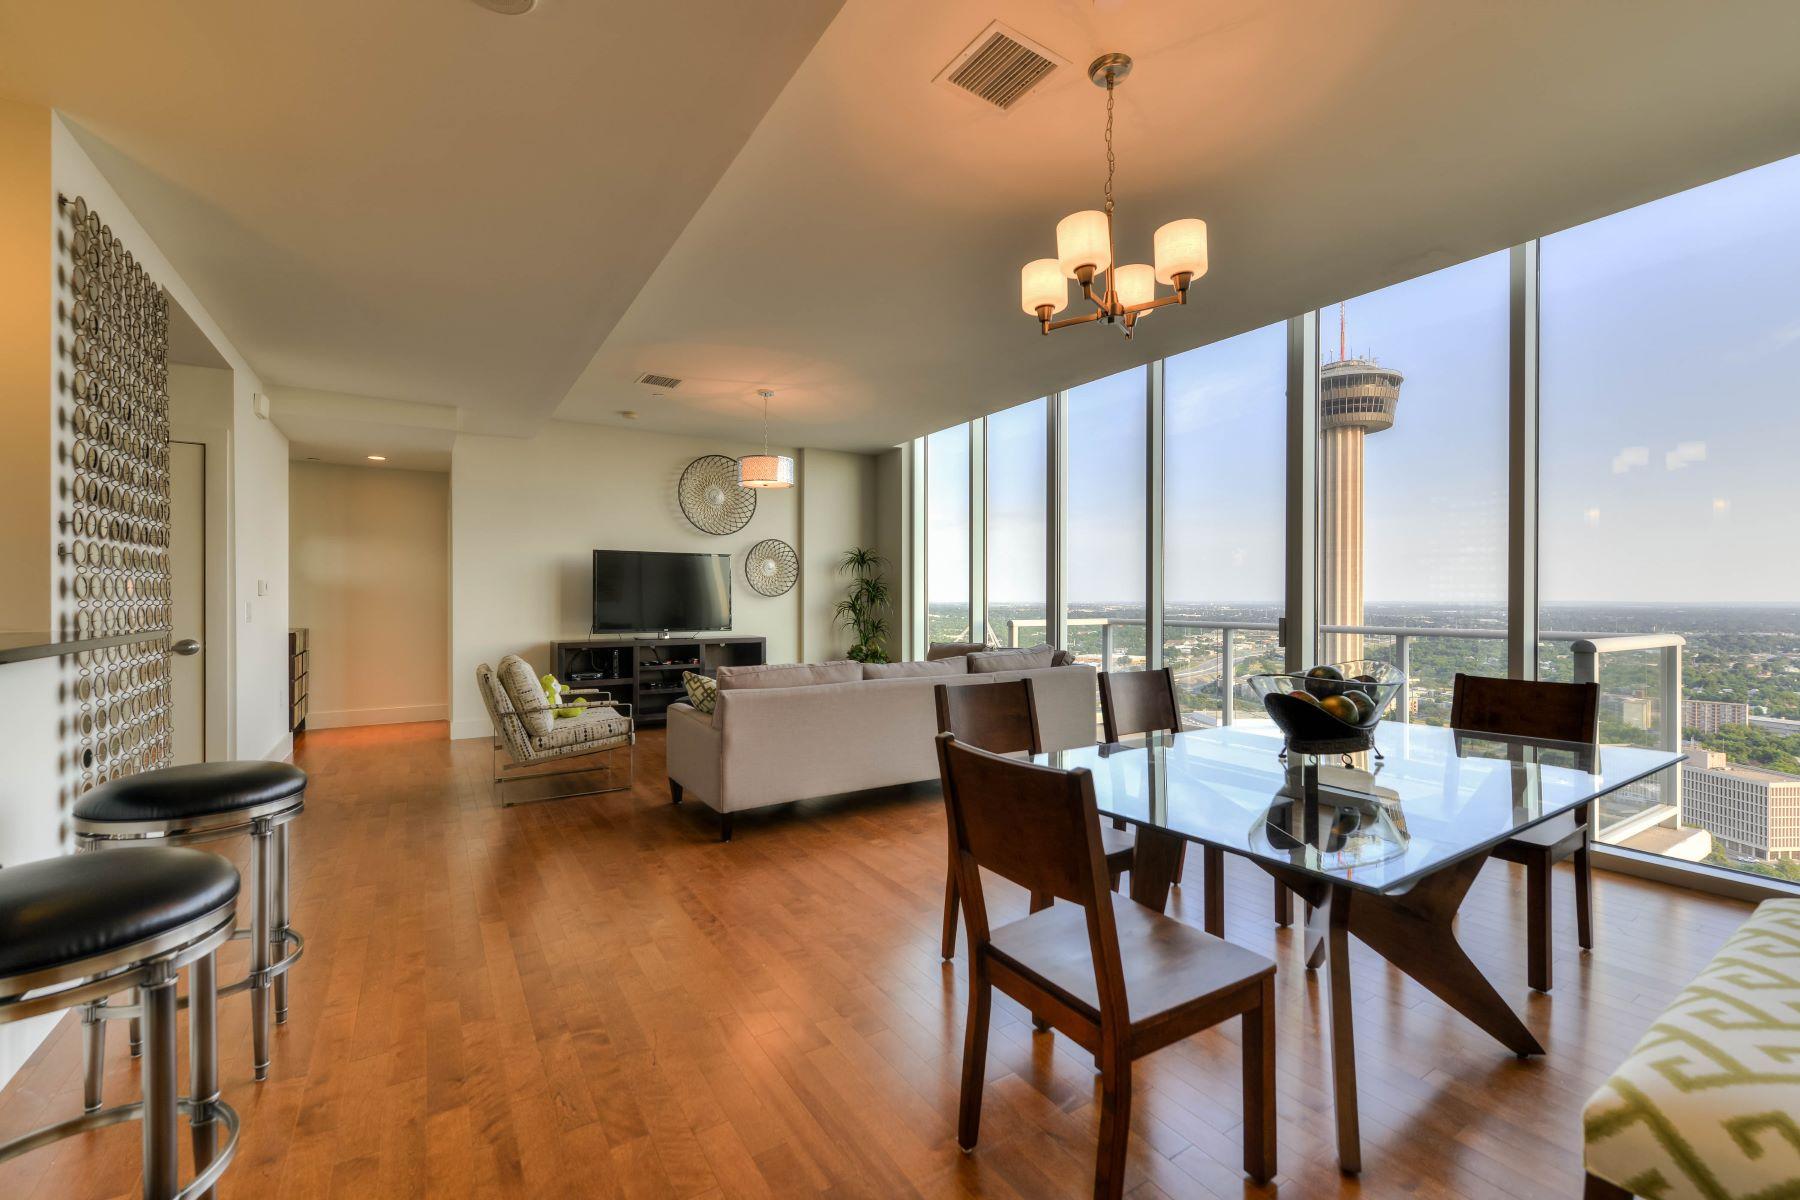 Condominium for Rent at 610 E. Market Street #3105 610 E. Market Street #3105 San Antonio, Texas 78205 United States